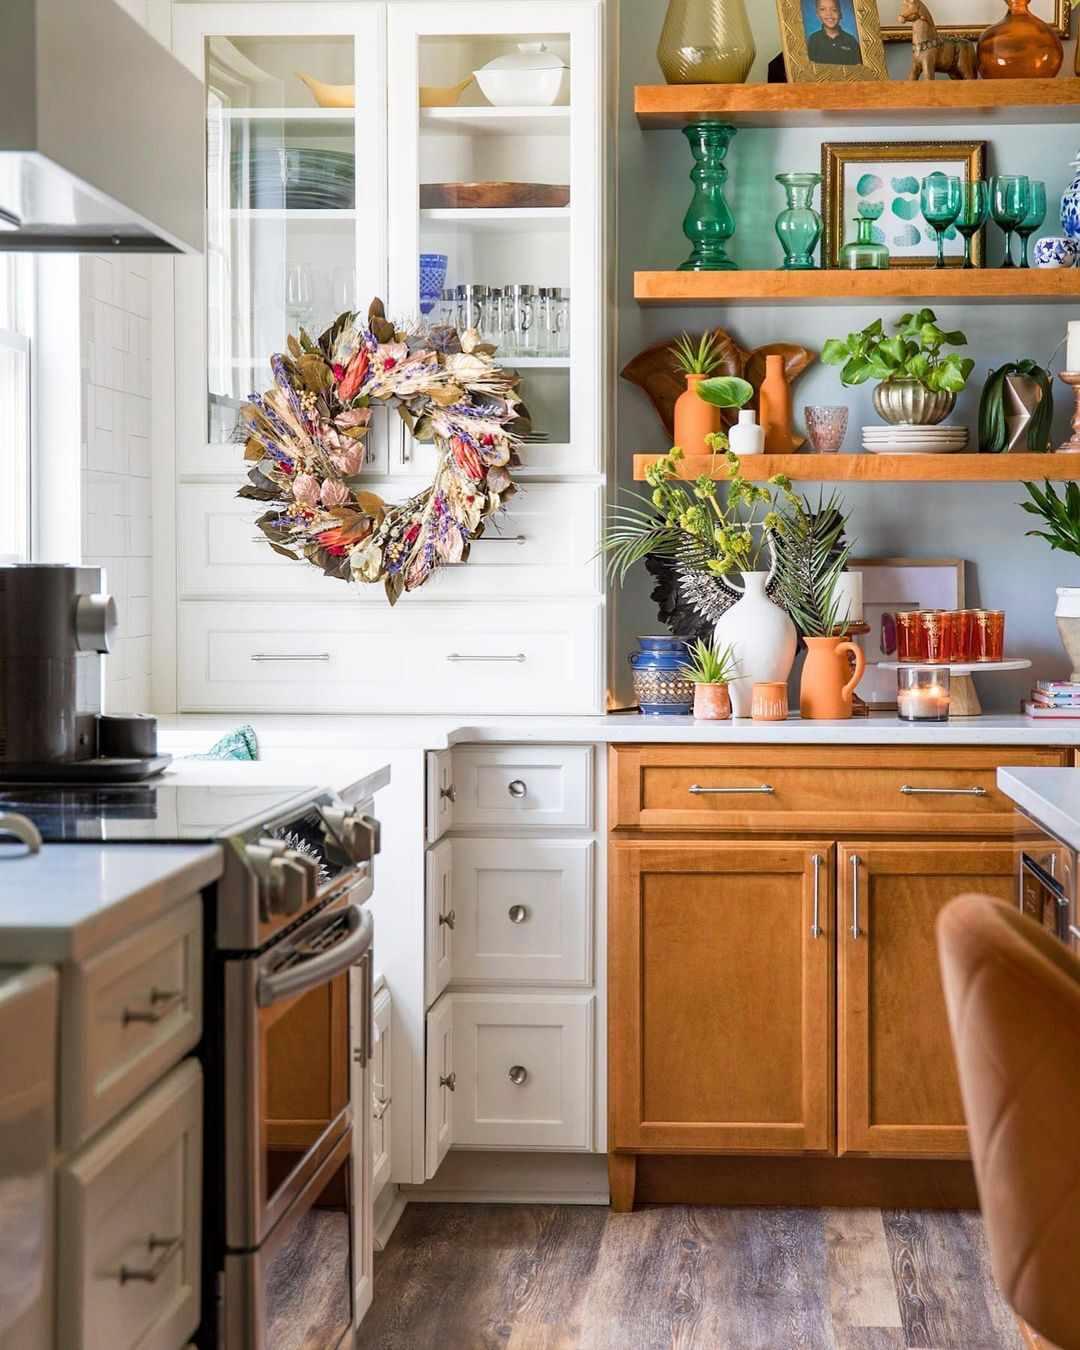 A multicolored wreath in the kitchen